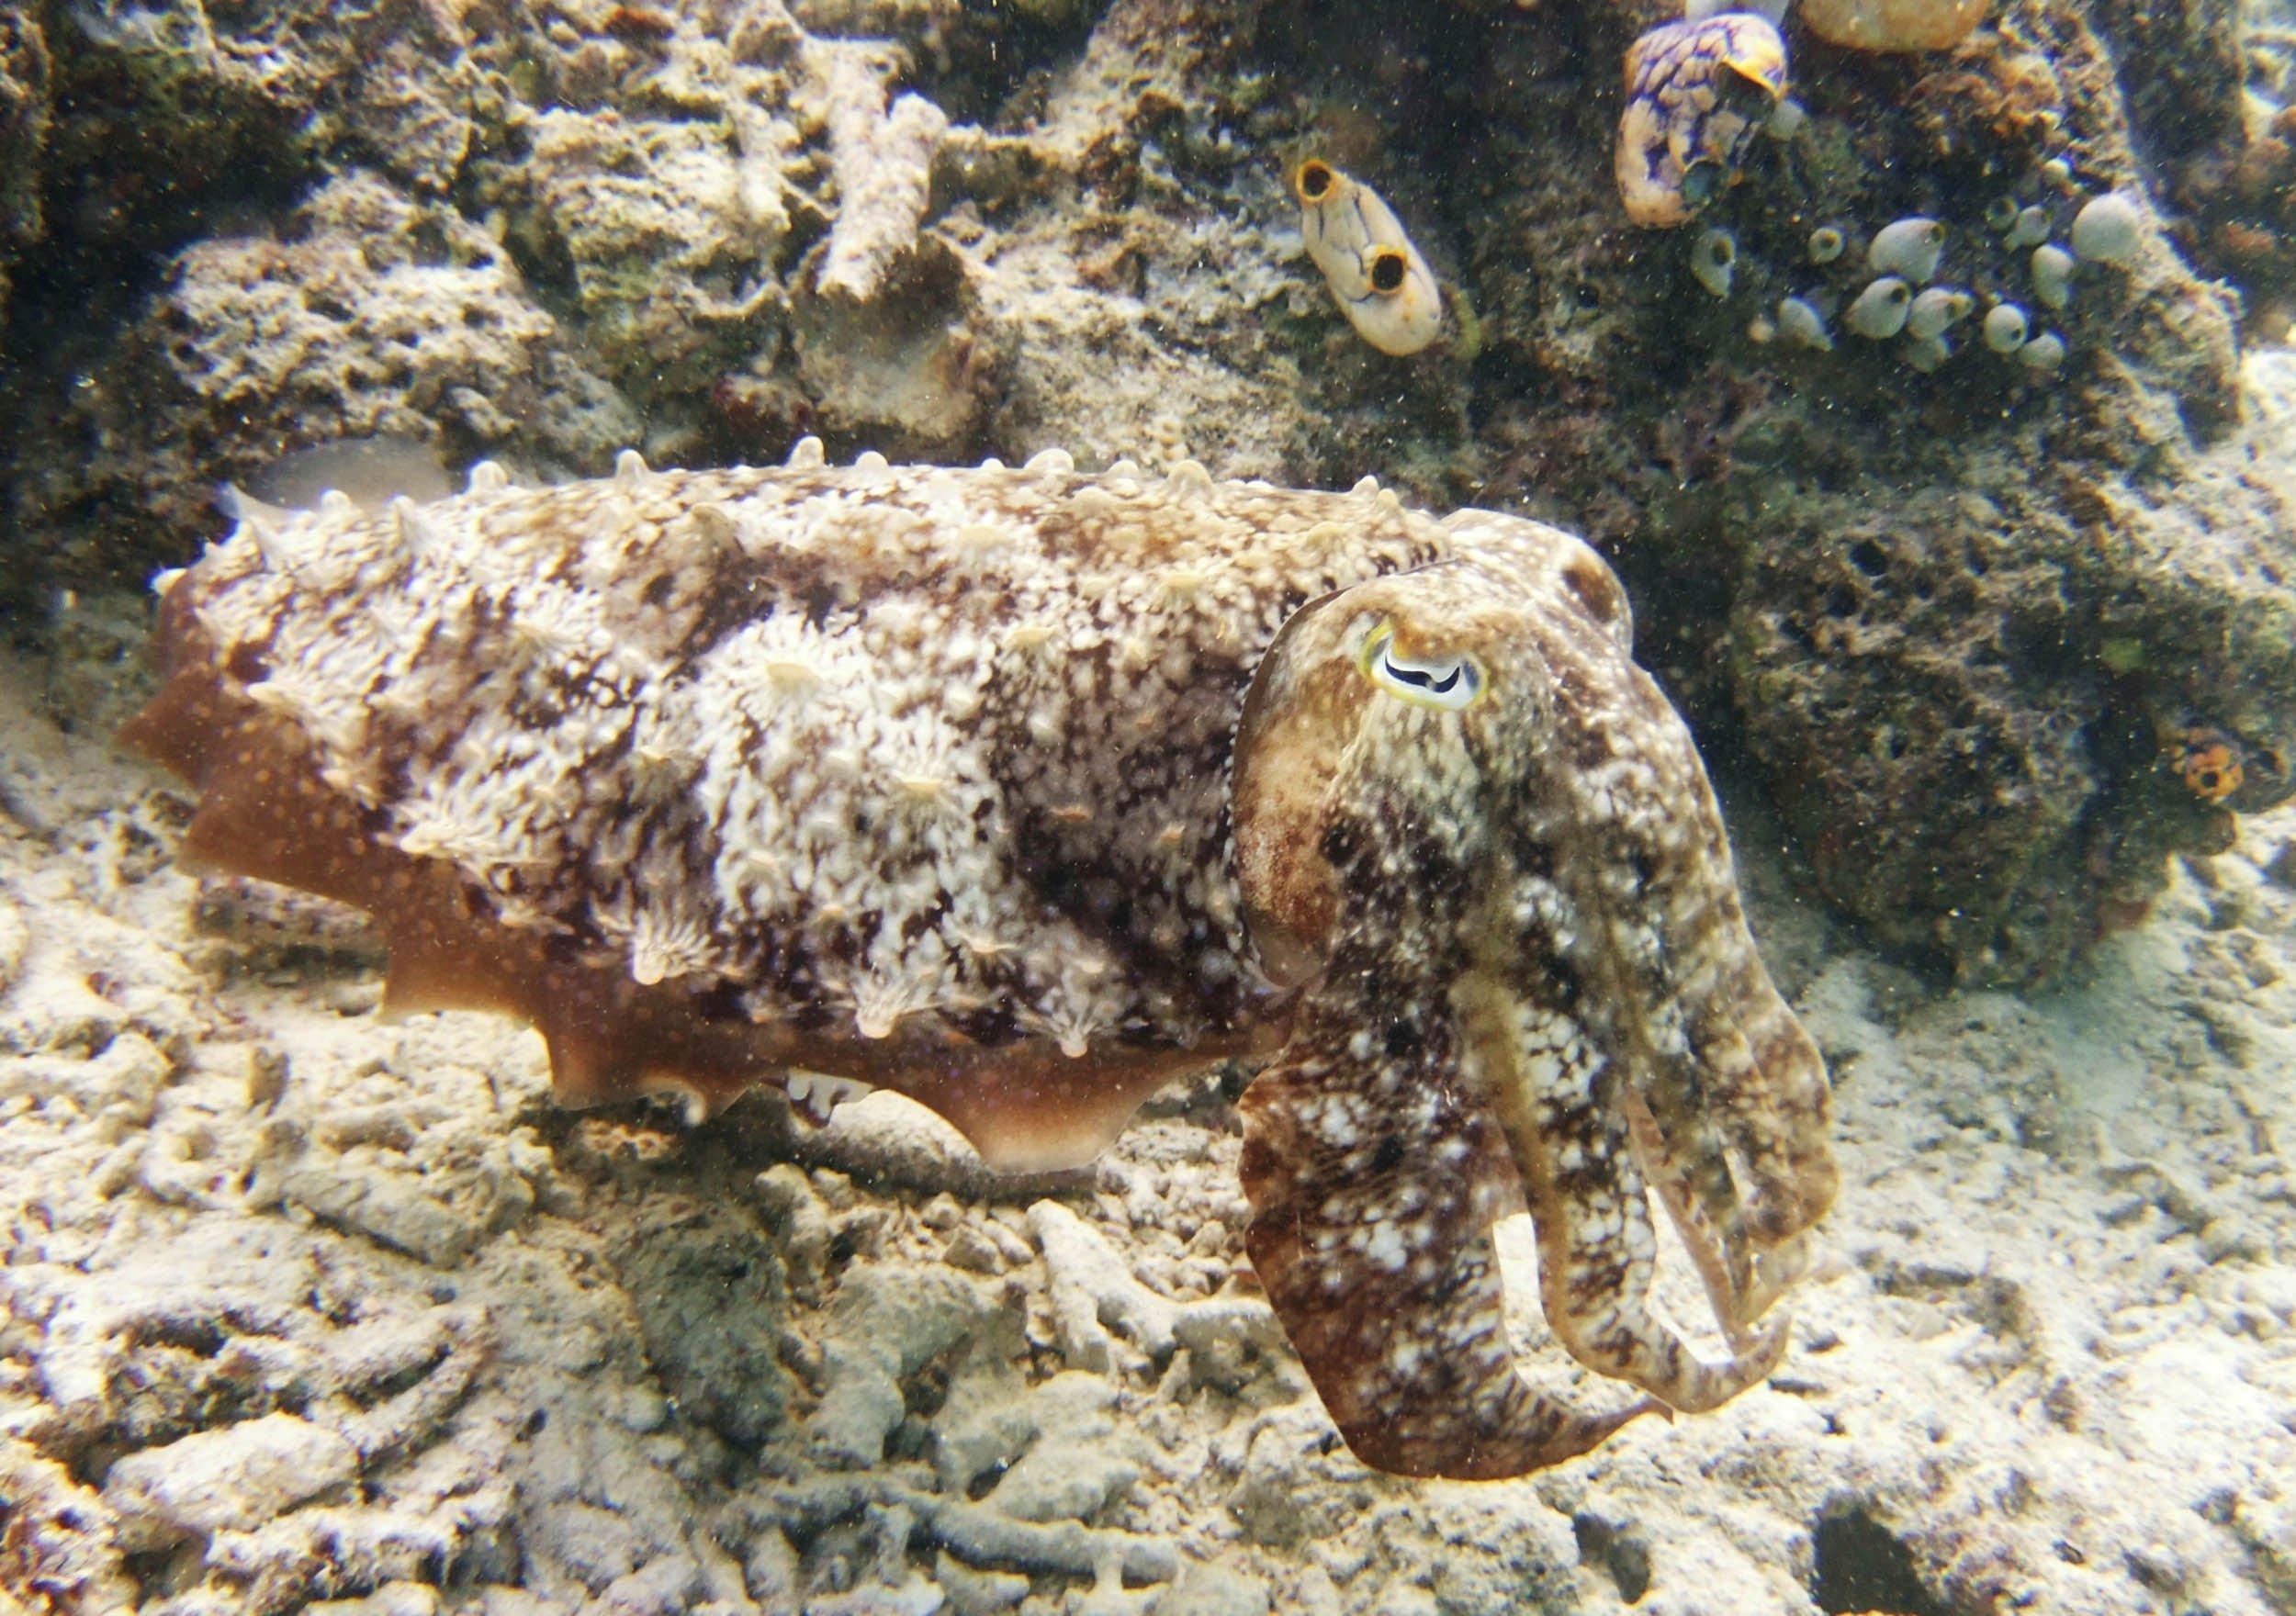 08_19_Cuttlefish